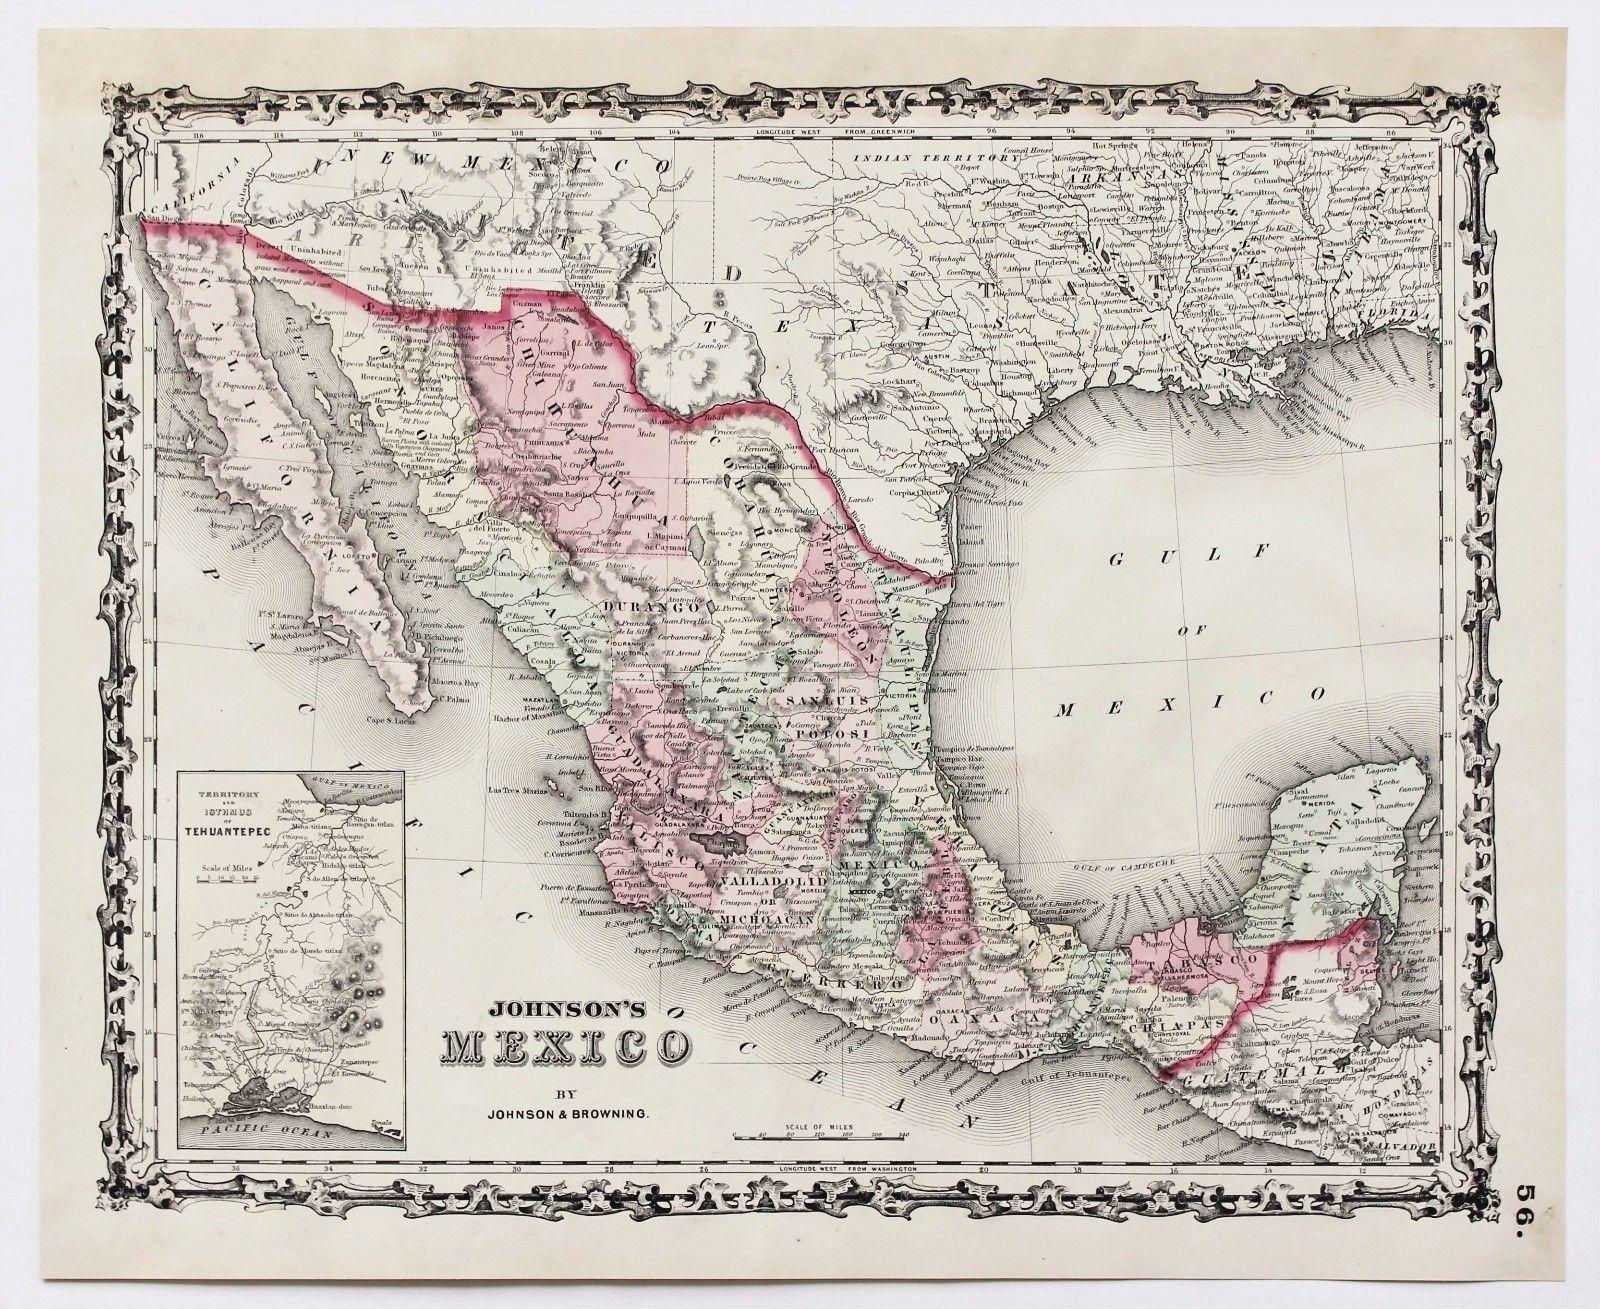 Map Of America In 1861.Antique 1861 Texas Mexico Map Central America Yucatan Baja